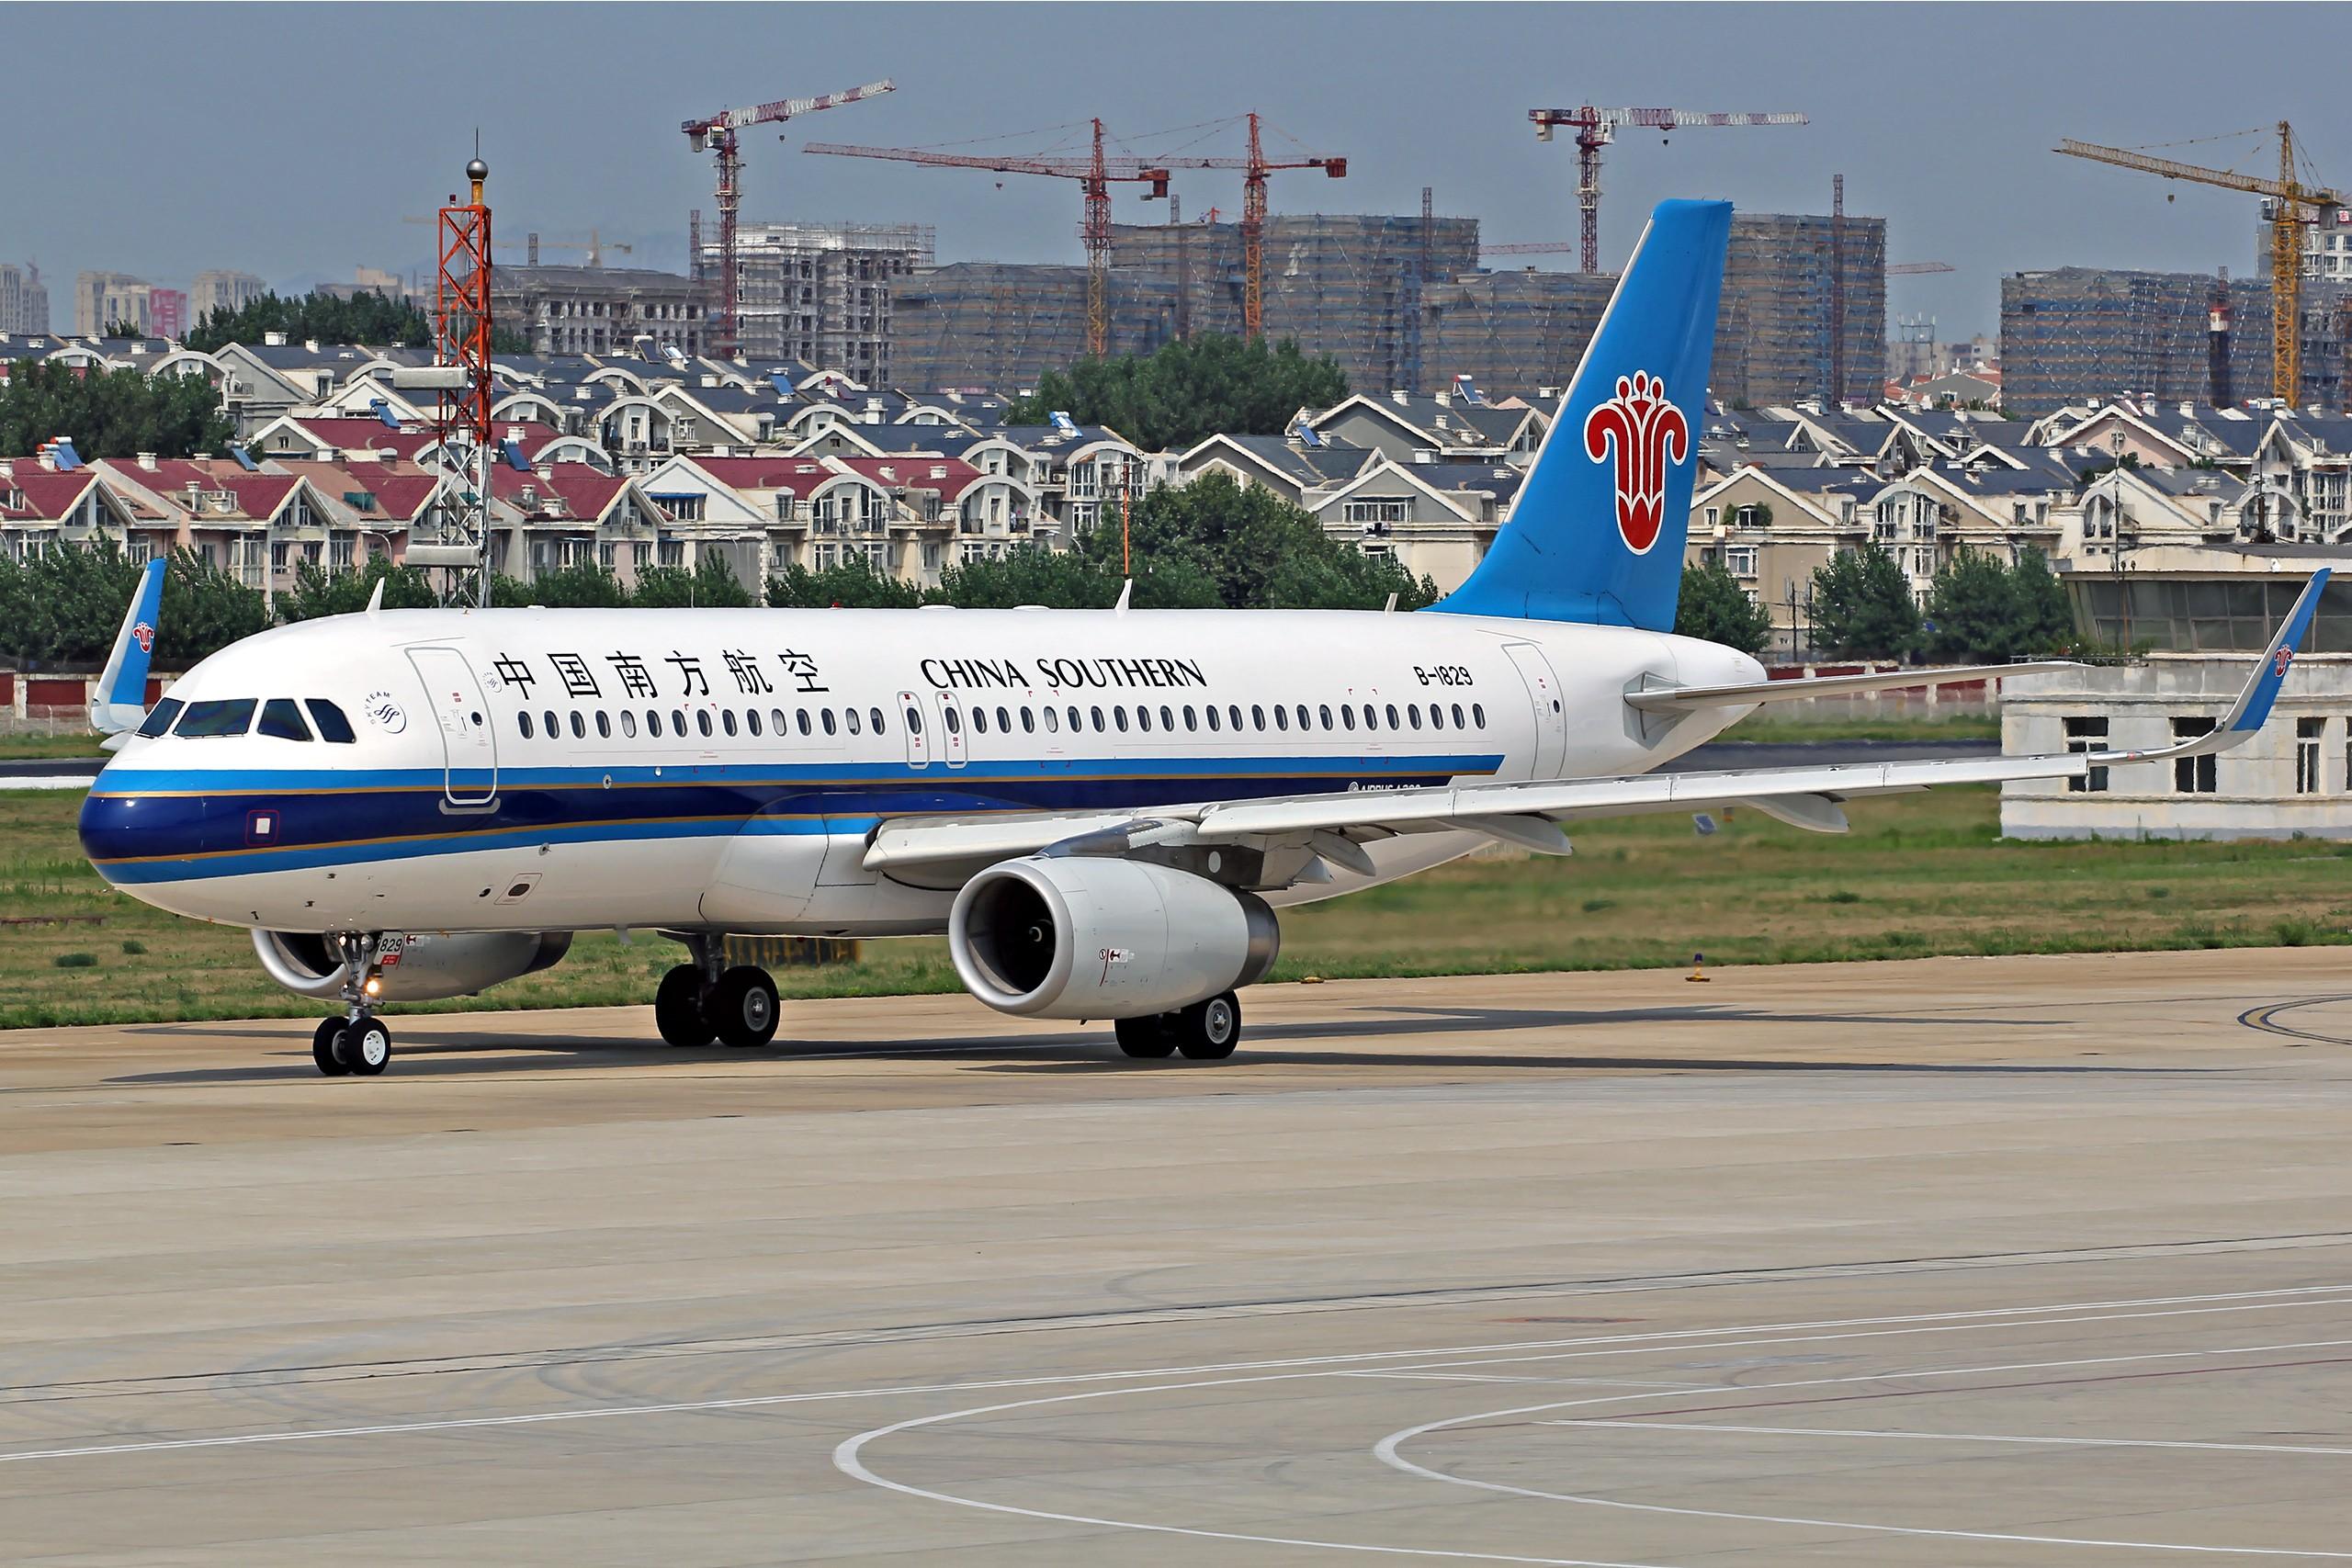 Re:[原创][DLC]...窄体机...2560x1707}Pix AIRBUS A320-200 B-1829 中国大连周水子国际机场